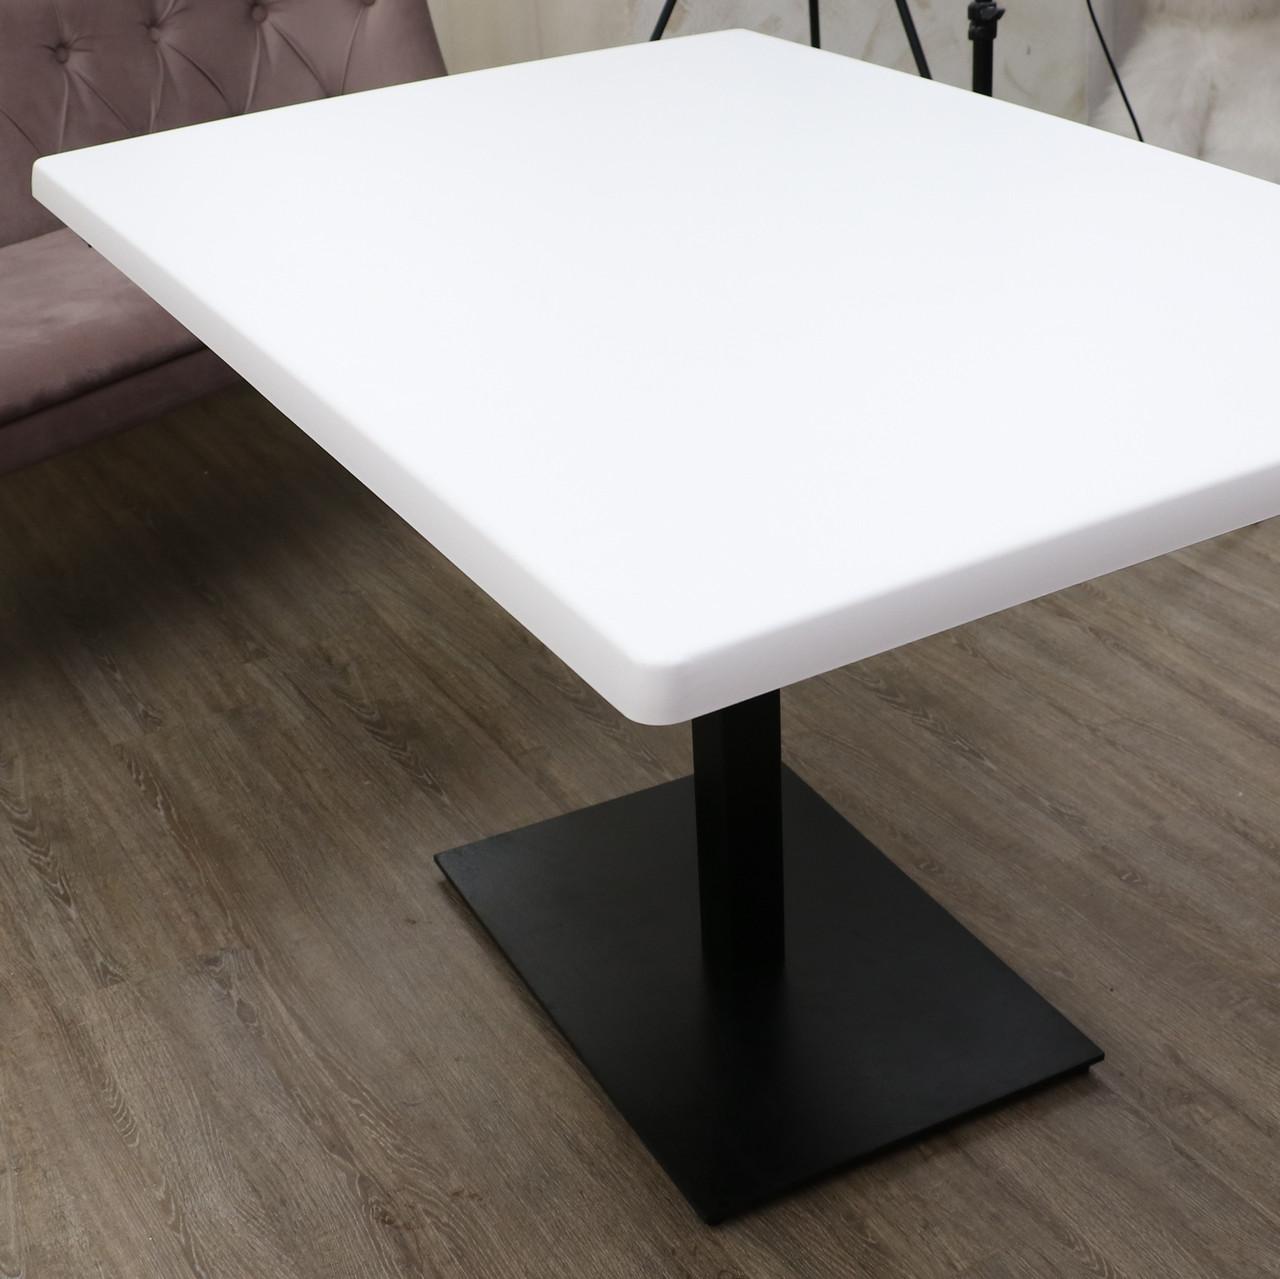 Столешница Topalit белая Pure White Pure White 60 см круглая